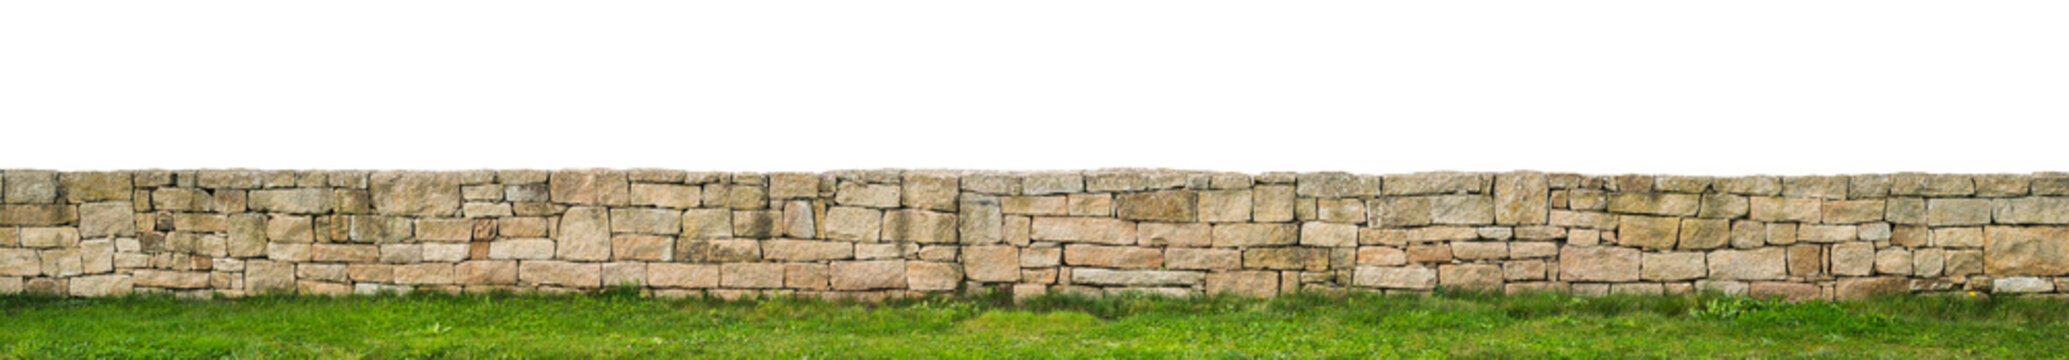 Panorama einer schönen Gartenmauer als Trockenmauer aus Granitblöcken - Panorama of a beautiful garden wall as a natural stone wall made of granite